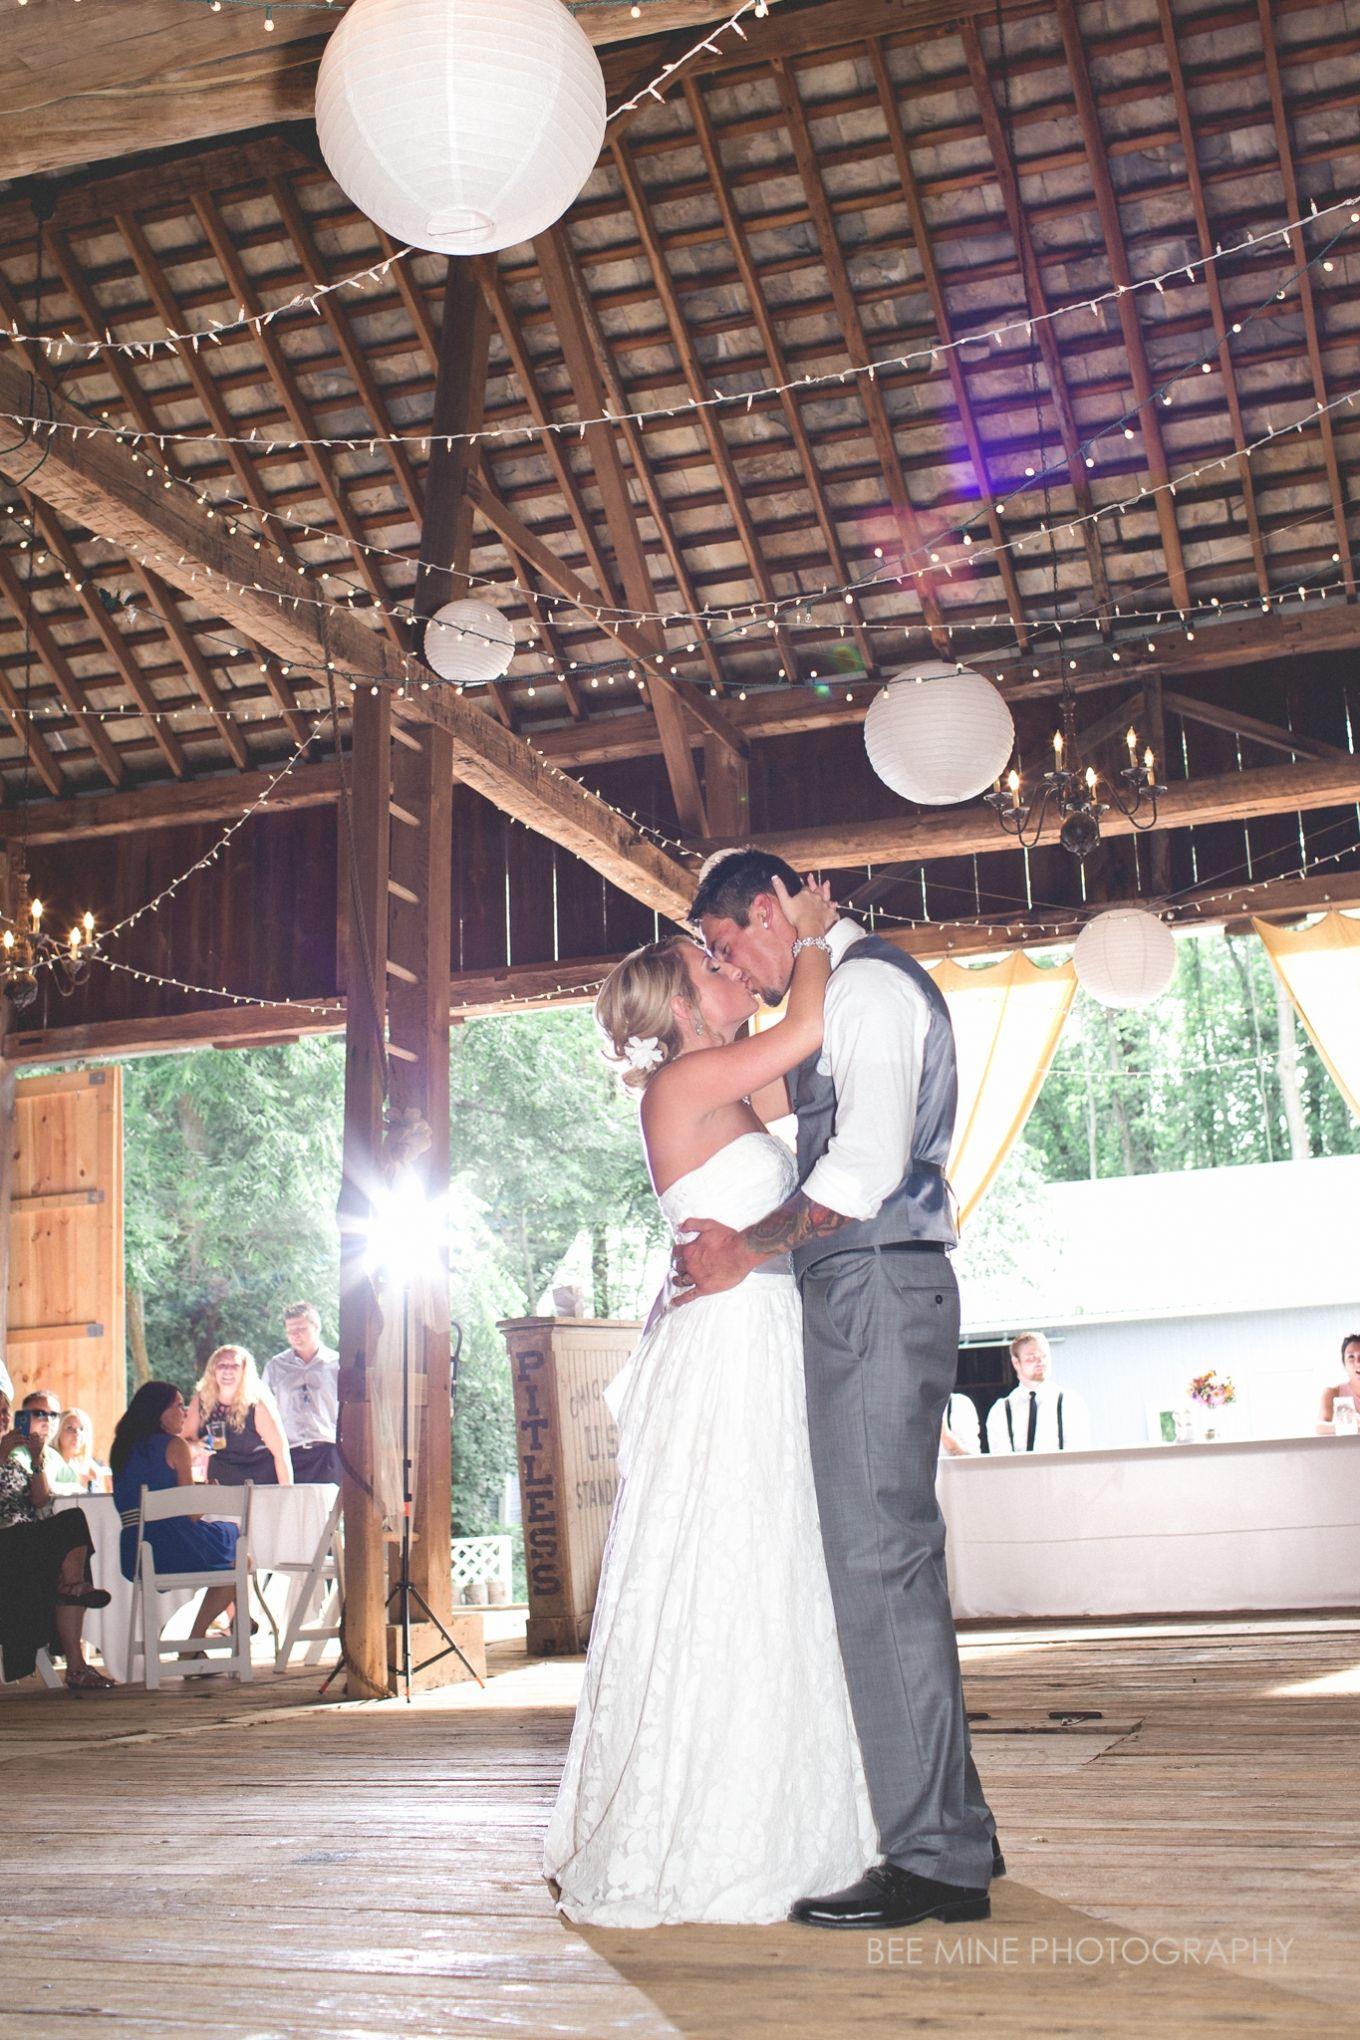 outdoor weddings near akron ohio%0A Bee Mine Photography  Northeast Ohio Photographer   Weddings wedding  photography  wedding exit   bmp    portfolio   Pinterest   Canton ohio